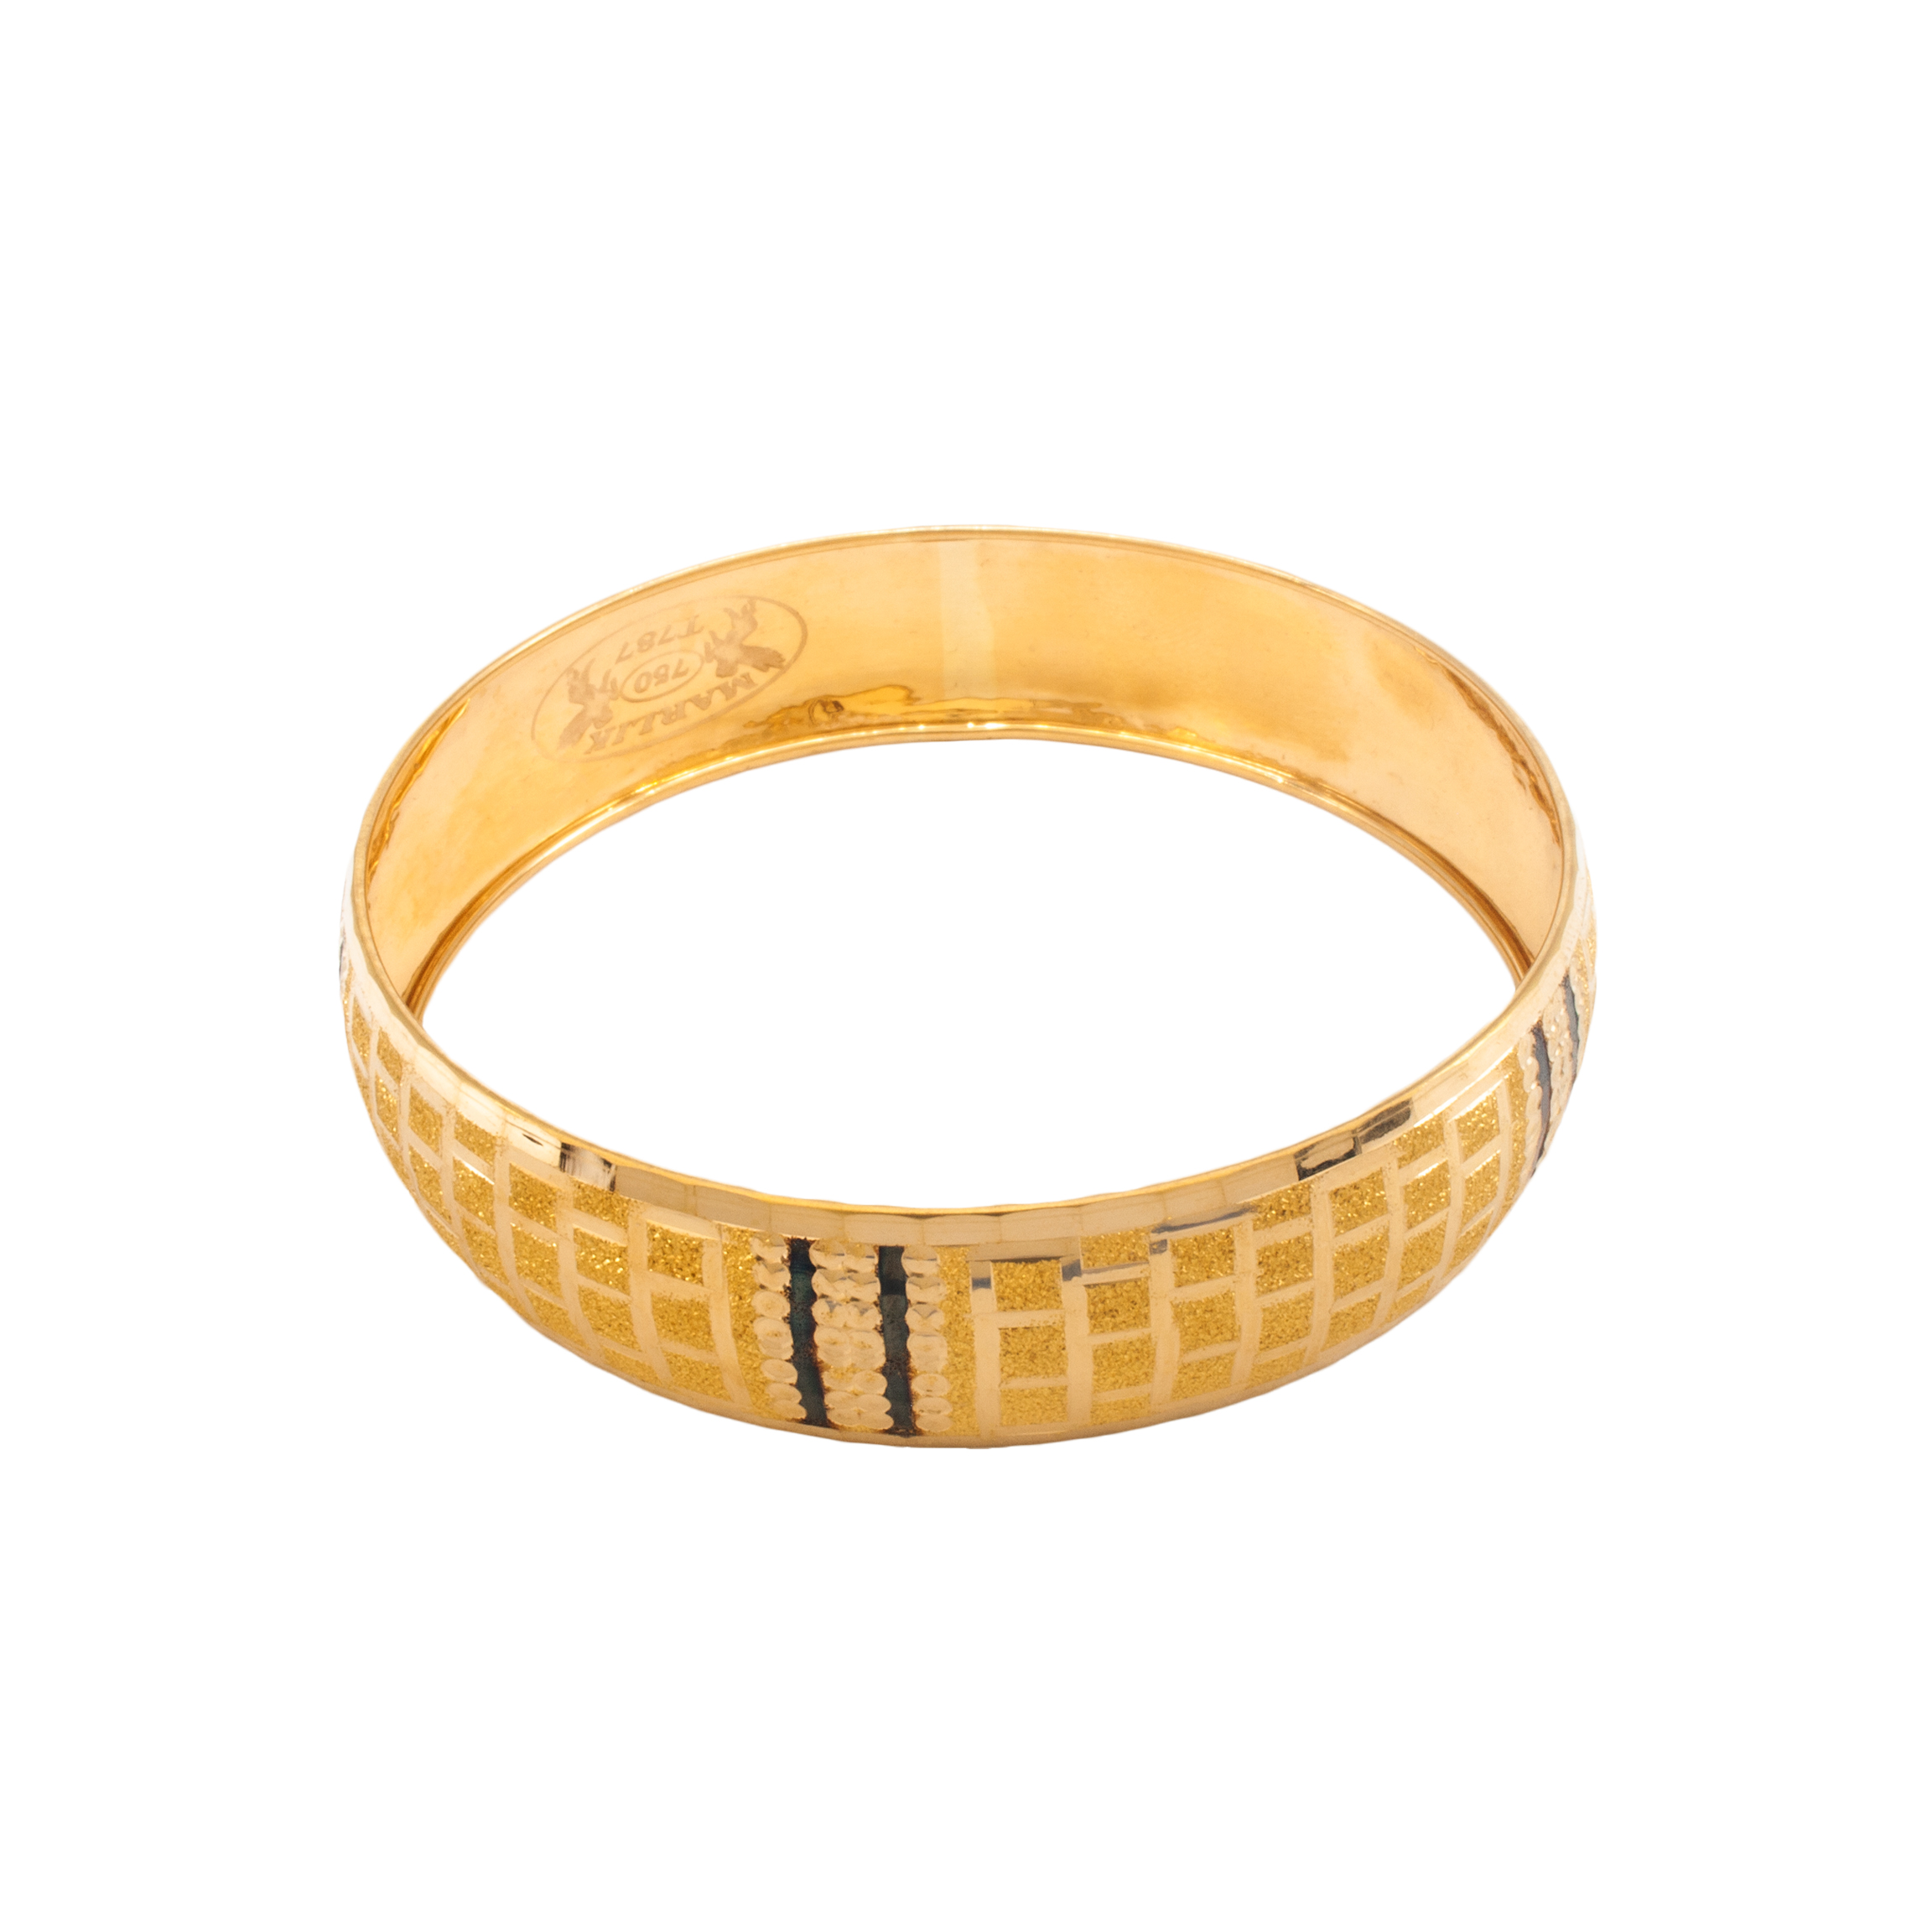 النگو طلا ۱۸ عیار زنانه دُرج مدل VB05-1